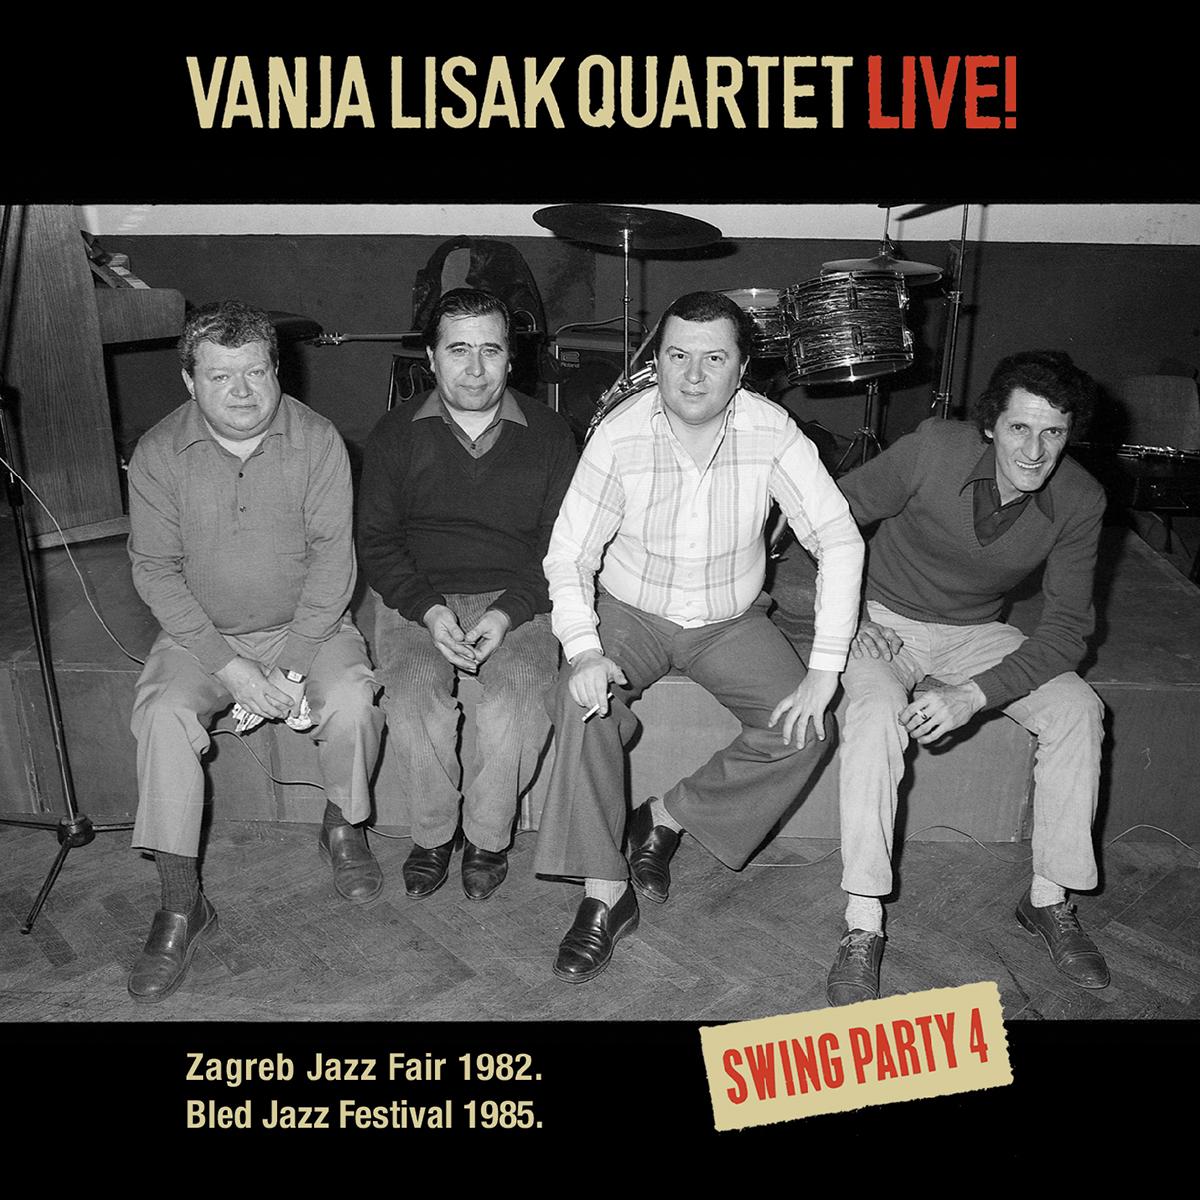 VANJA LISAK QUARTET - Live! (Swing Party 4)